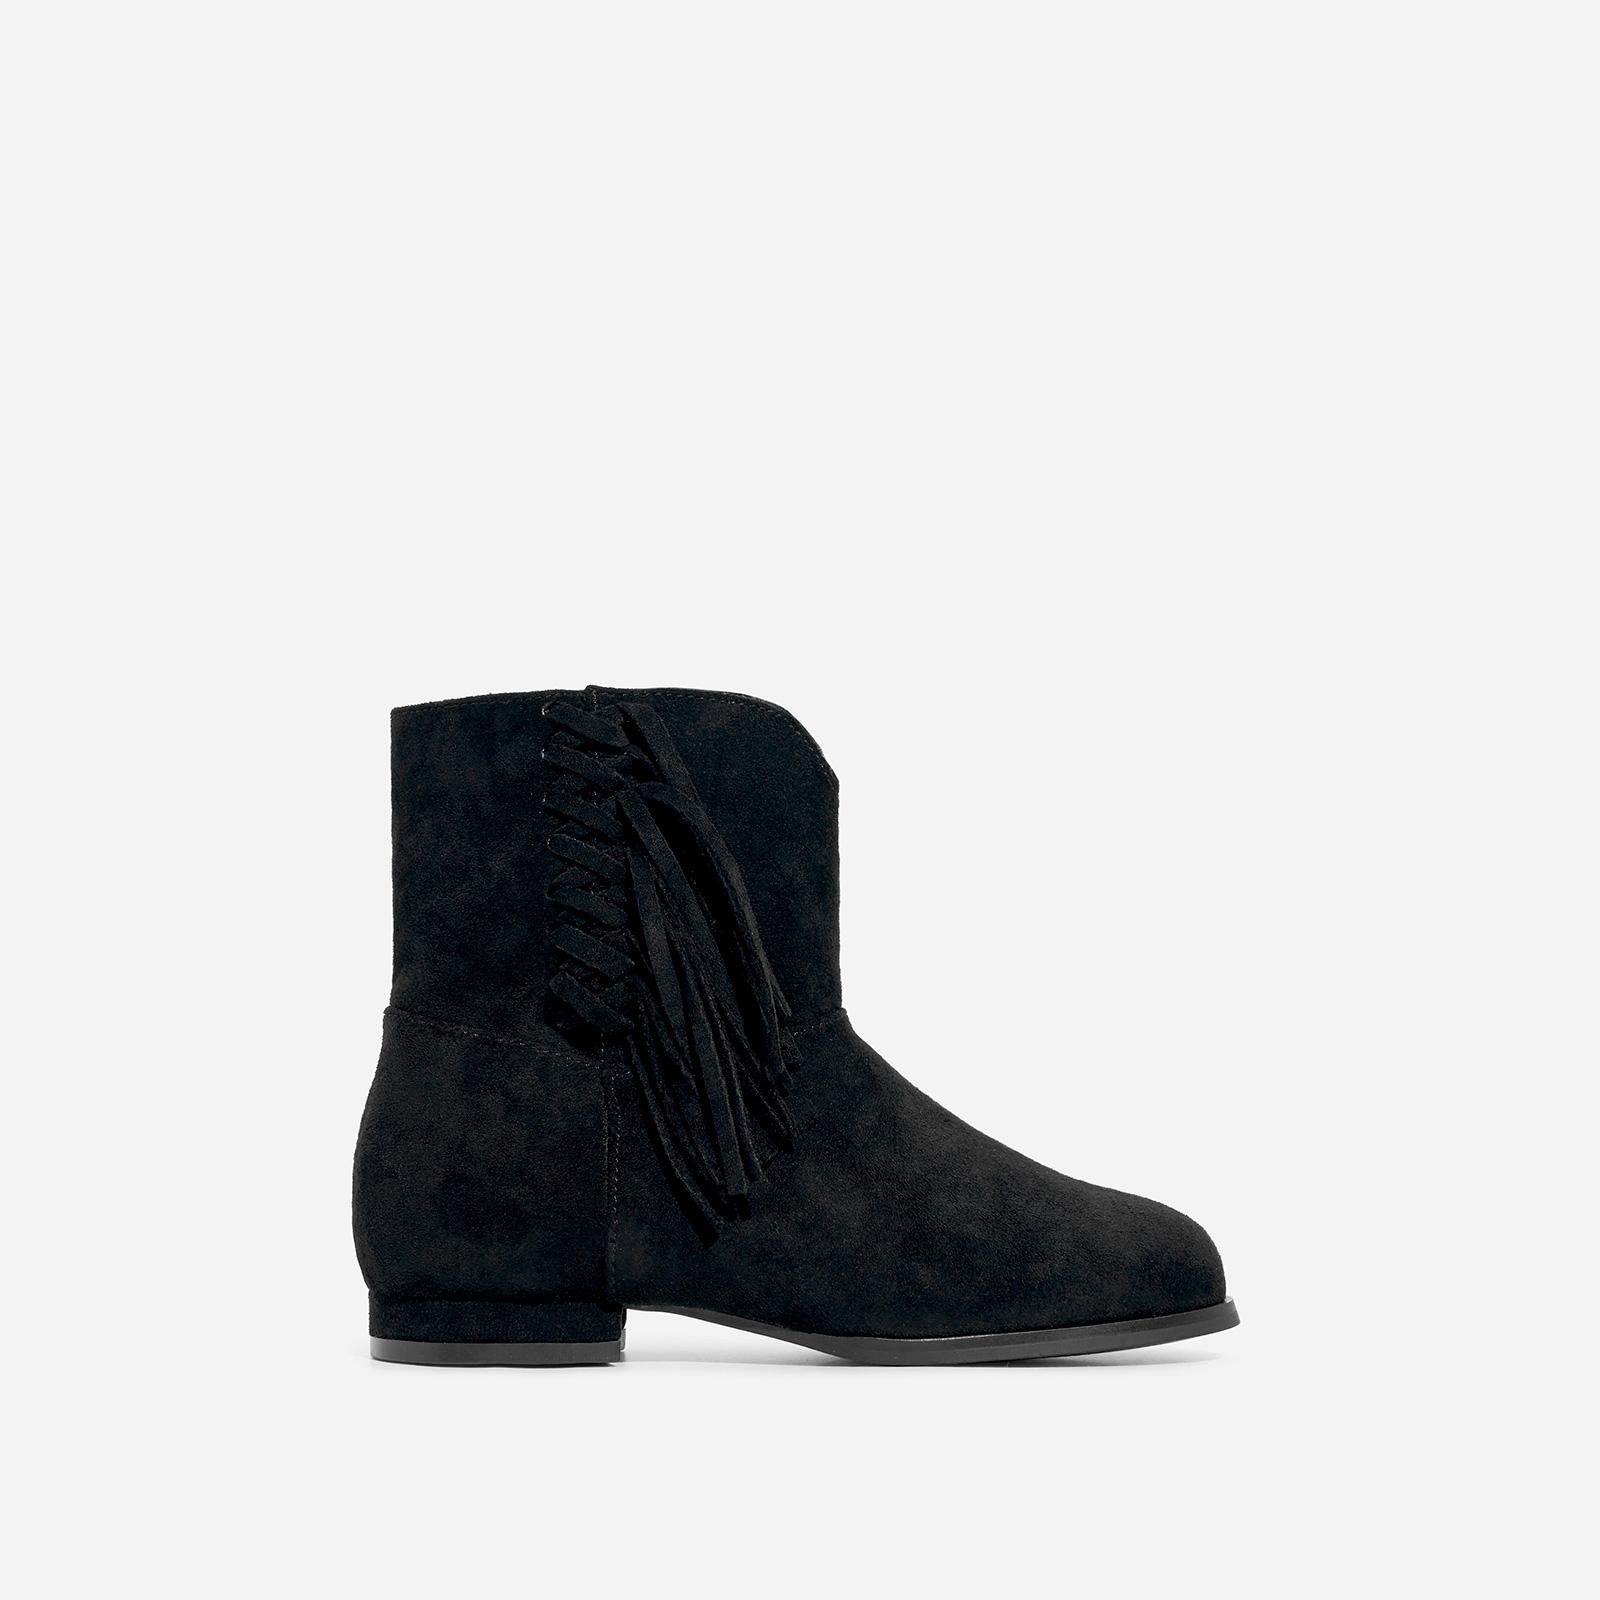 Sweetheart Girl's Tassel Detail Ankle Western Boot In Black Faux Suede